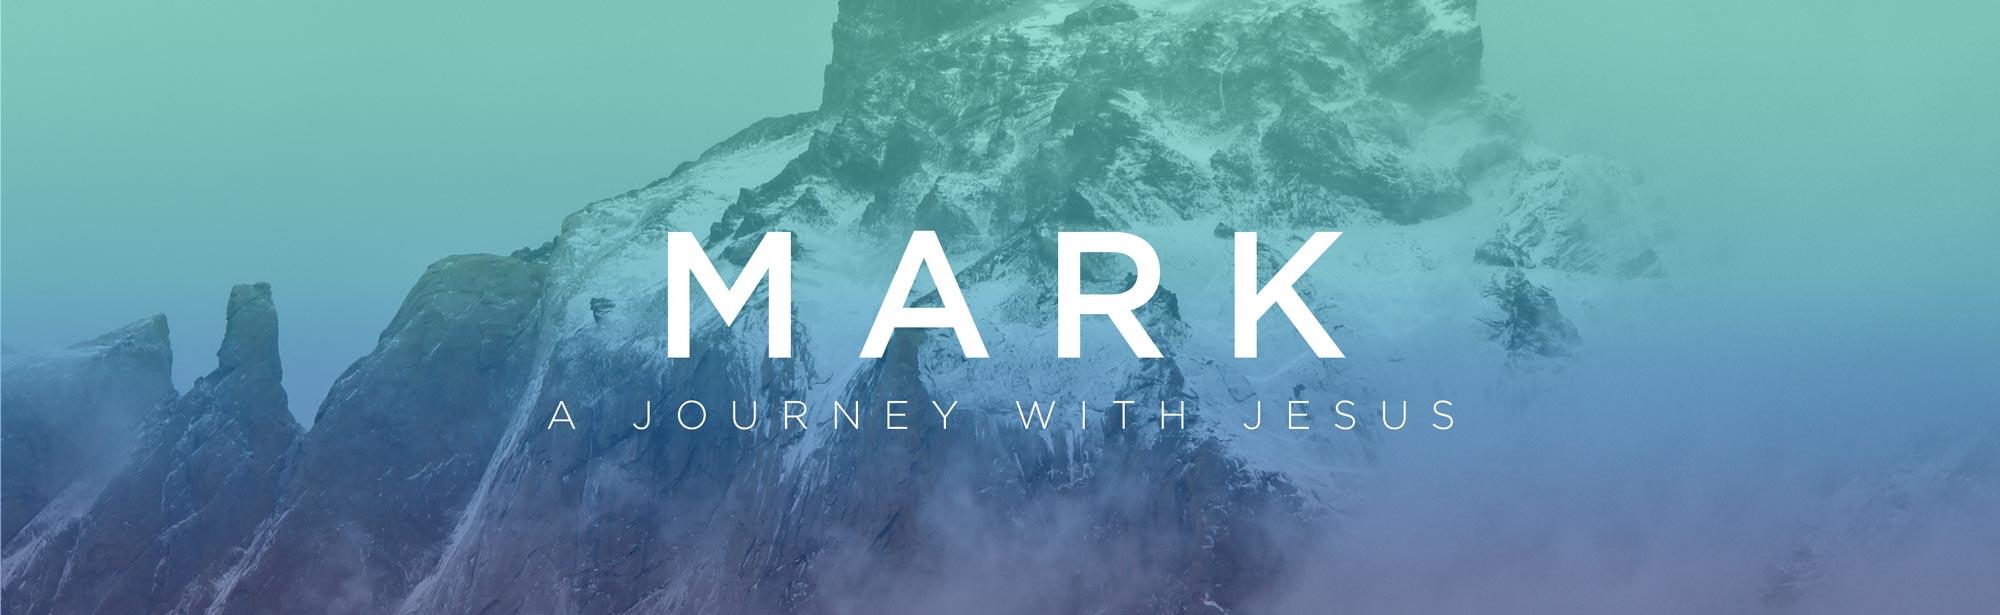 Mark: A Journey With Jesus - Winter Sermon Series - Grace Community Church